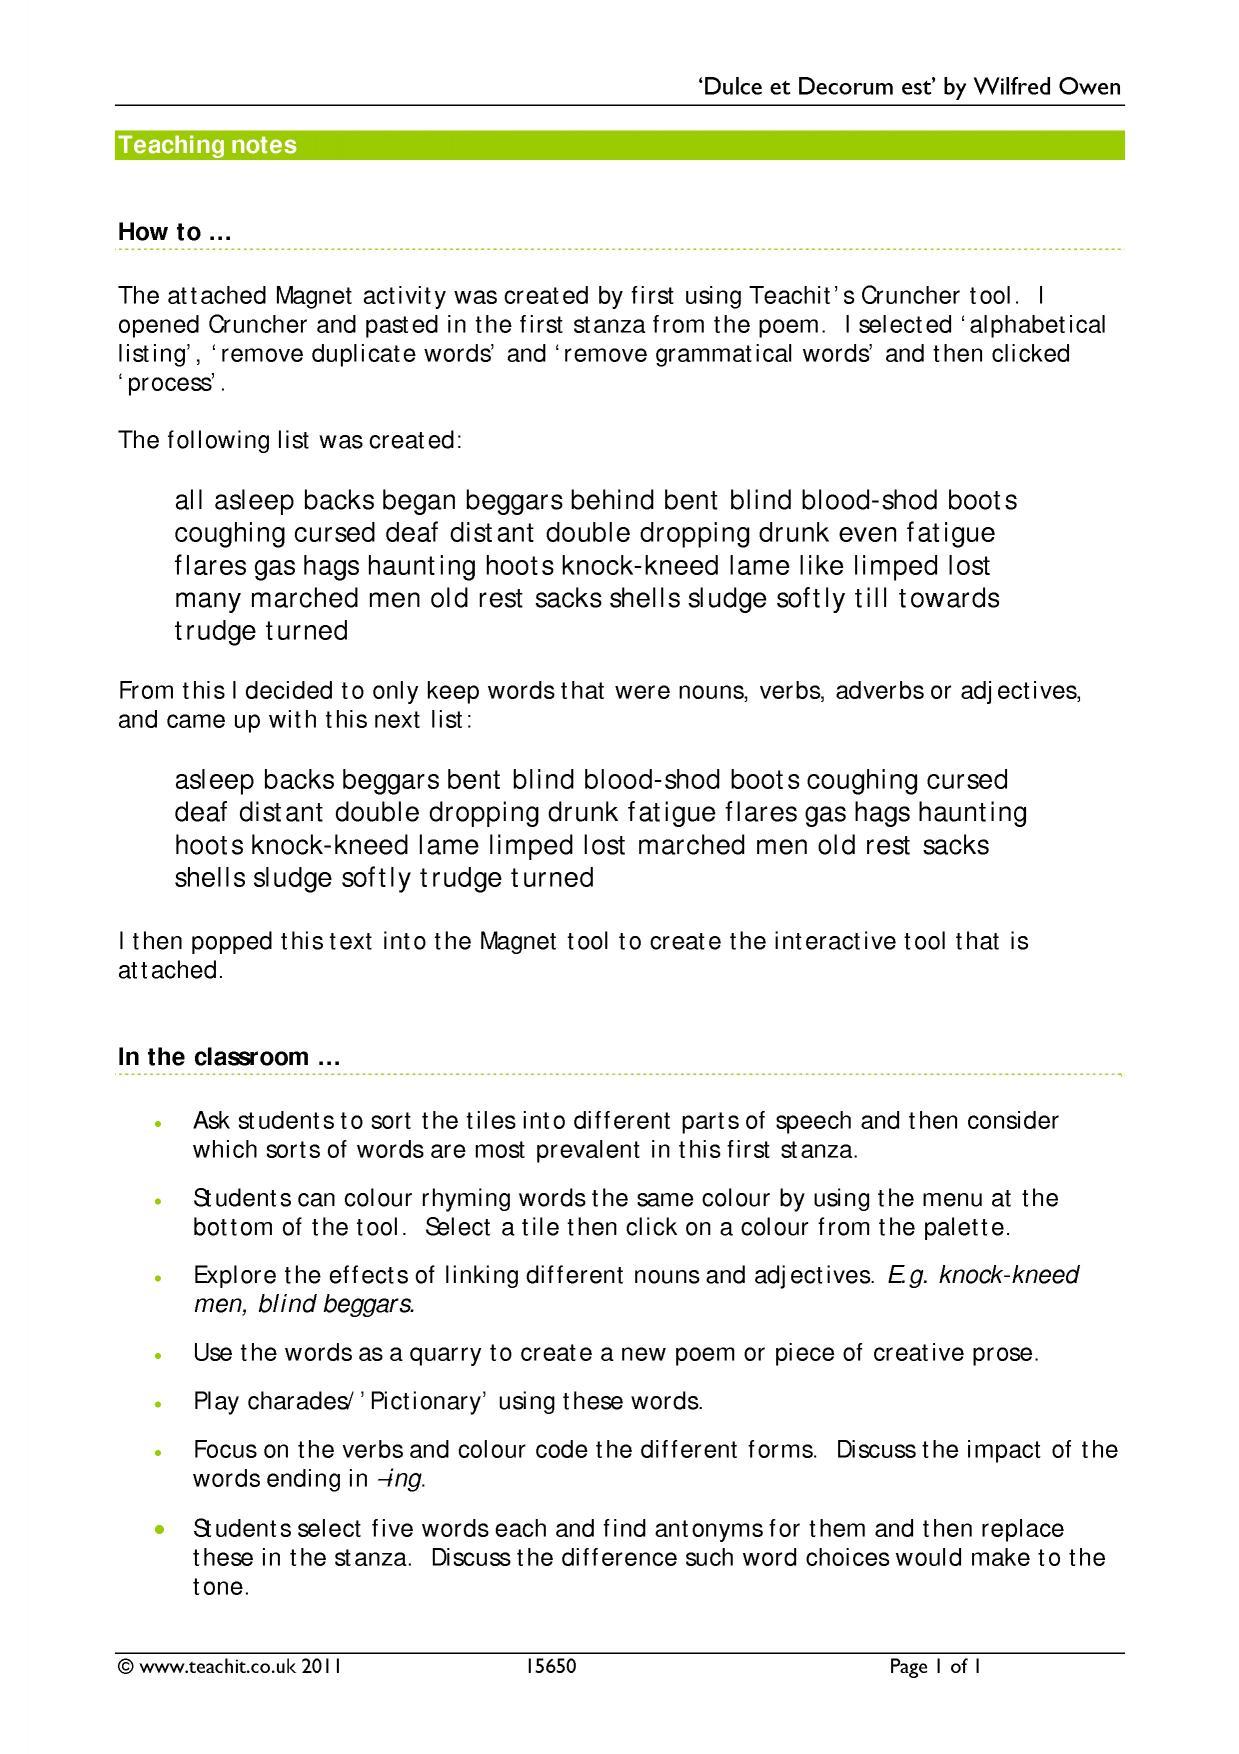 rupert brooke wilfred owen - search results - Teachit English